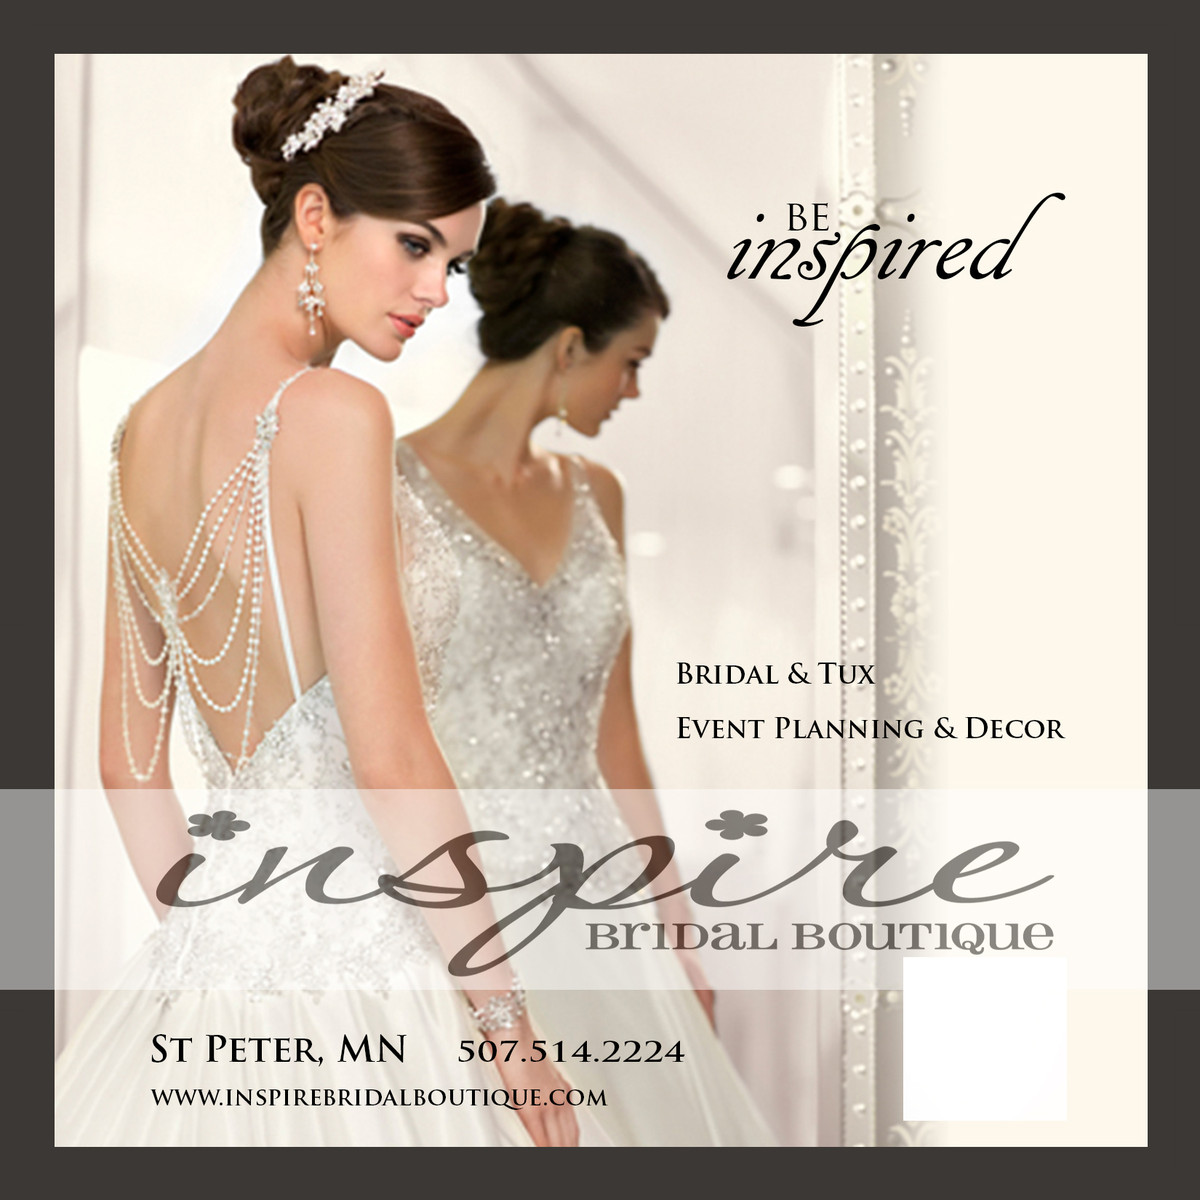 Inspire Bridal Boutique - Dress & Attire - Saint Peter, MN - WeddingWire